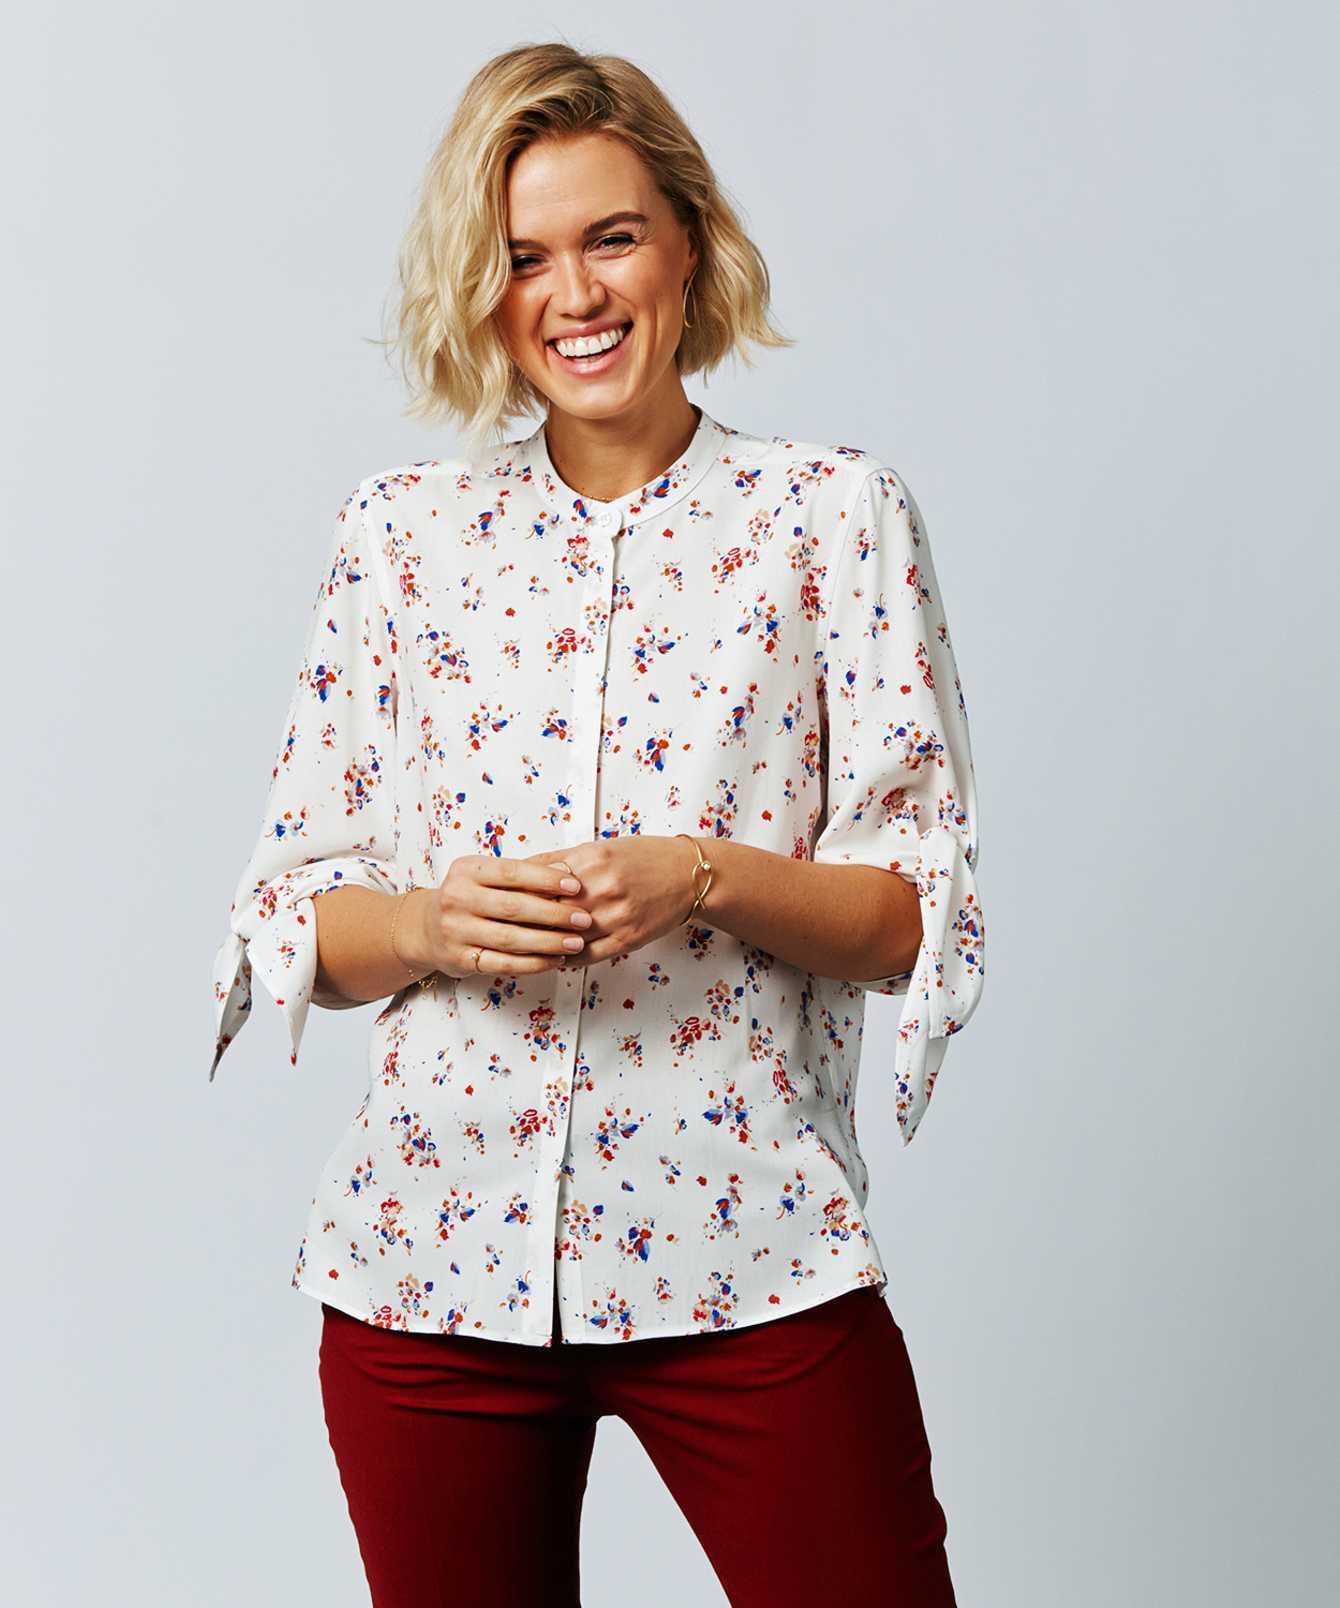 Shirt Hilda Floralys The Shirt Factory